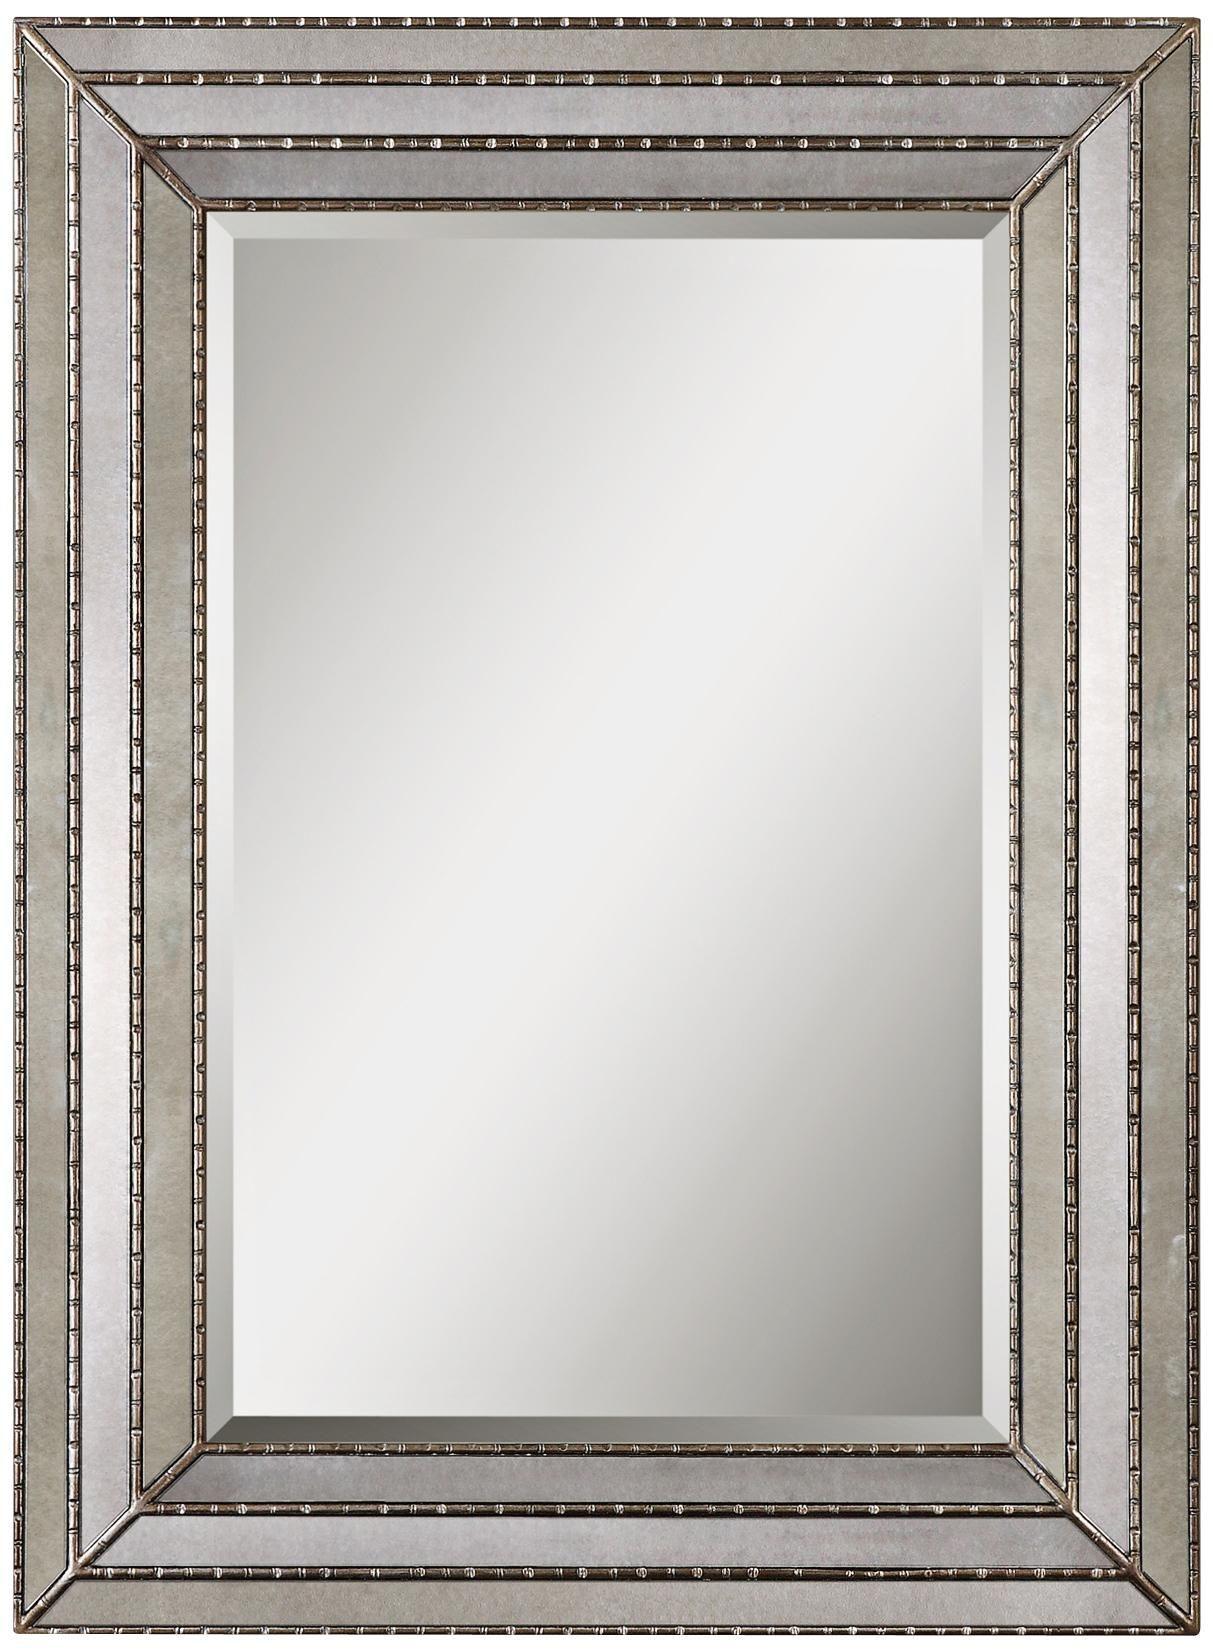 Uttermost Seymour 46 3 4 High Rectangular Wall Mirror Y5560 Lamps Plus Silver Antique Mirror Antique Mirror Glass Antique Mirror Frame